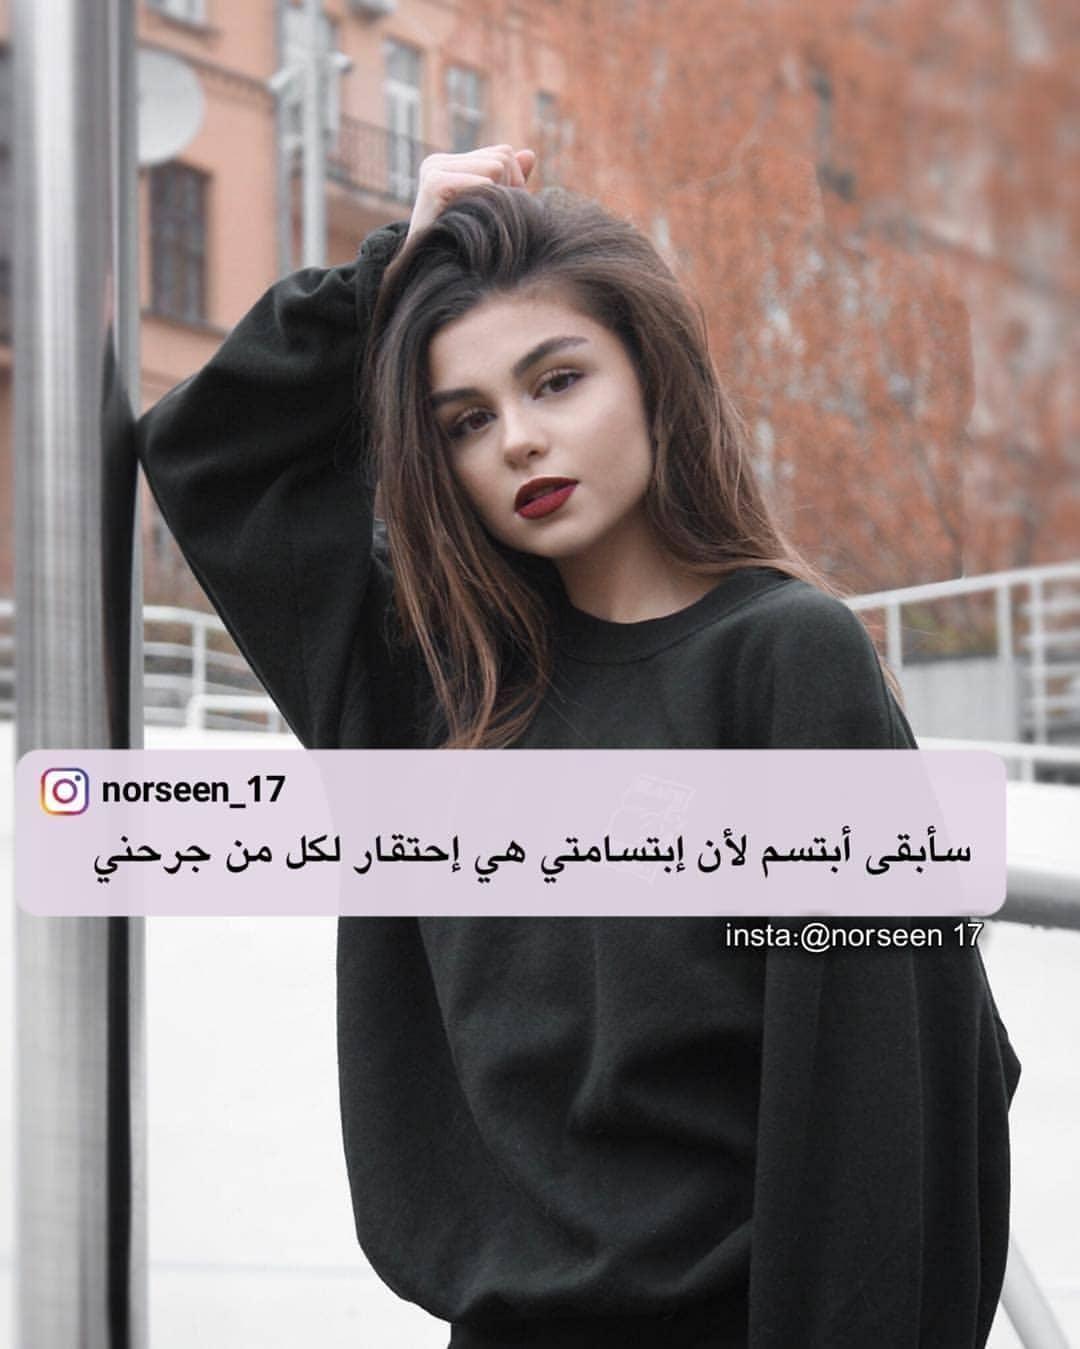 اقتباسات انستيجرام صور بنات 2019 For Android Apk Download Bad Girl Aesthetic Portrait Photography Women Photo Ideas Girl